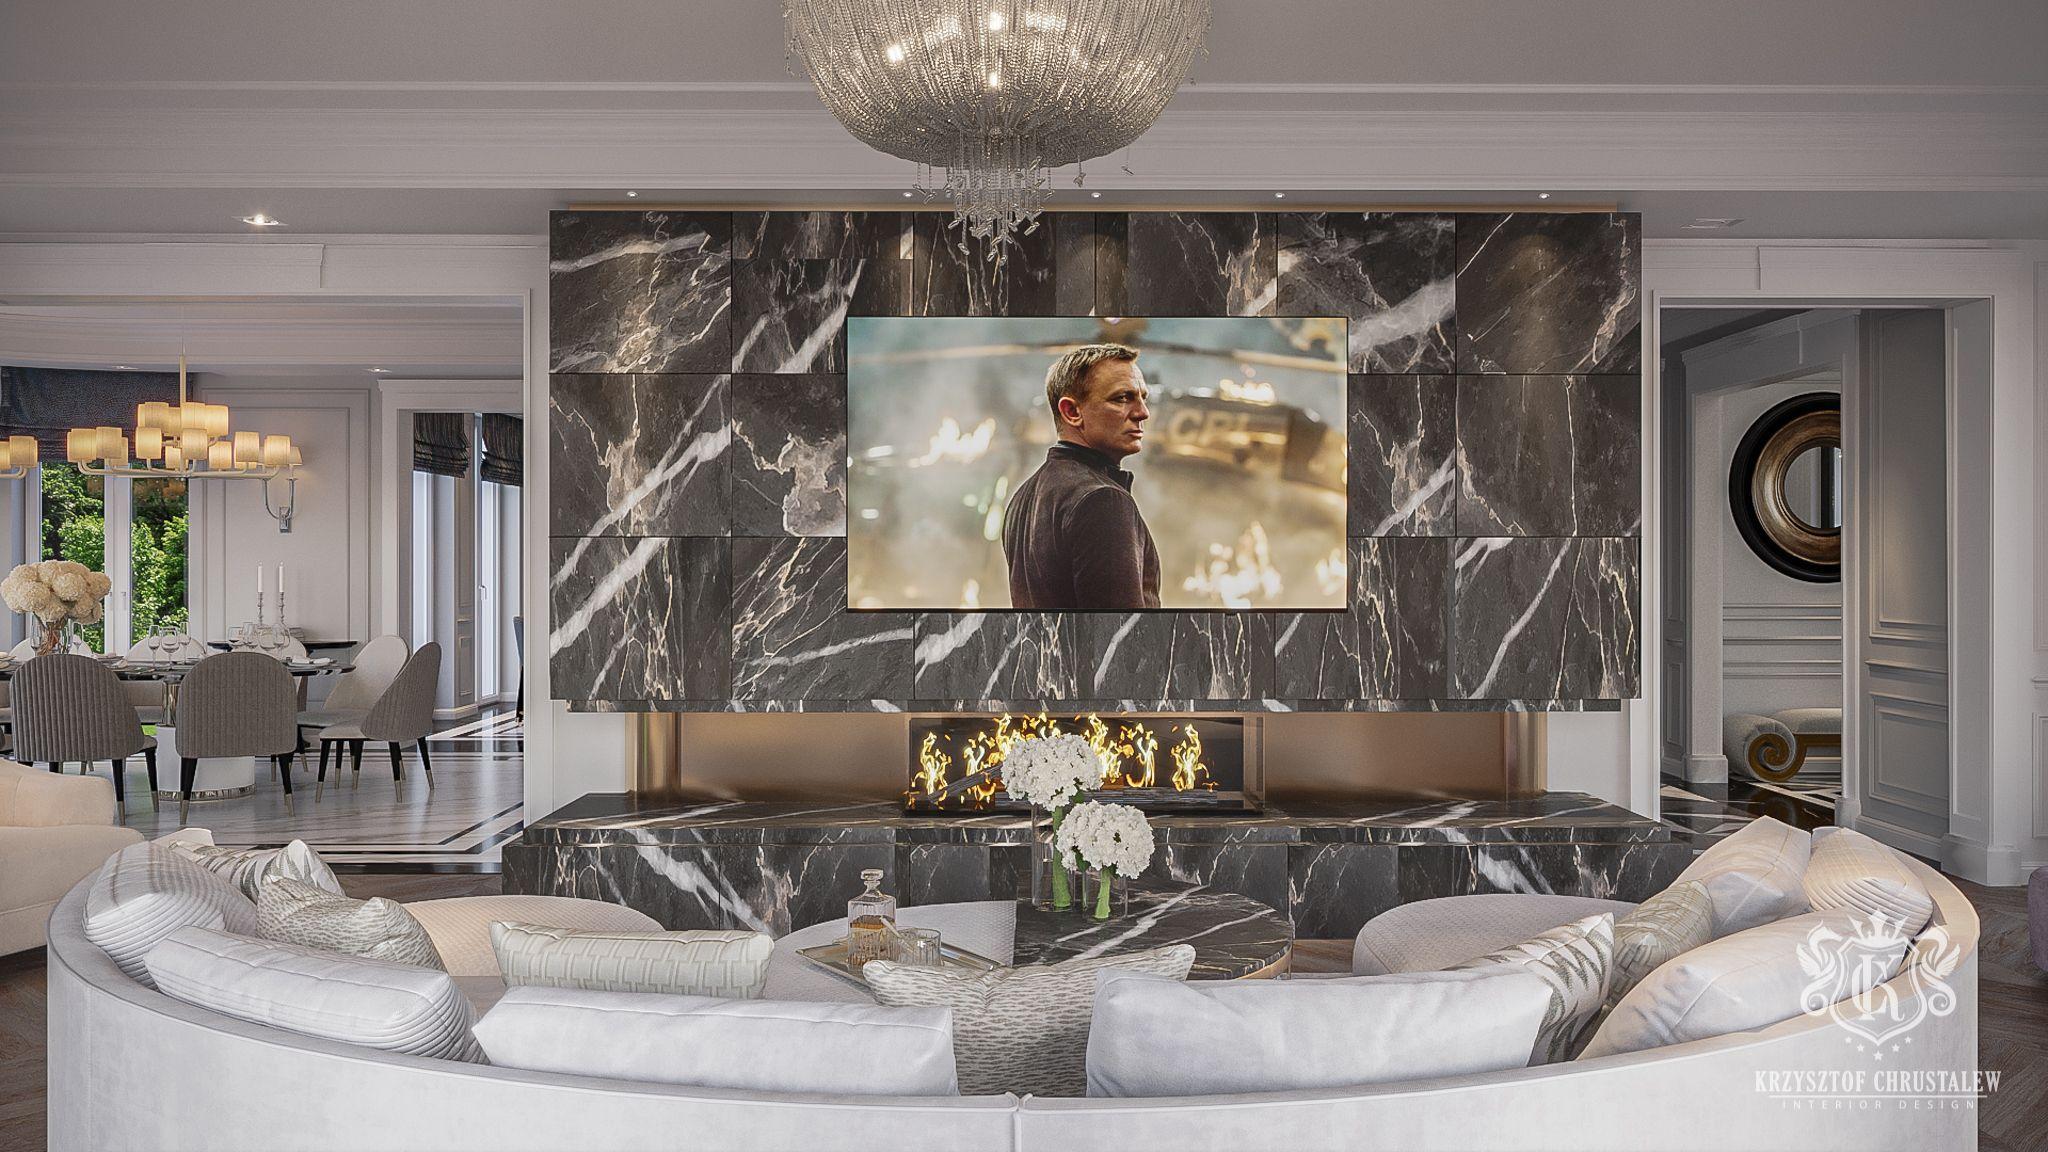 Klasyczne I Glamour Kc Design Design Kc Designs Home Decor